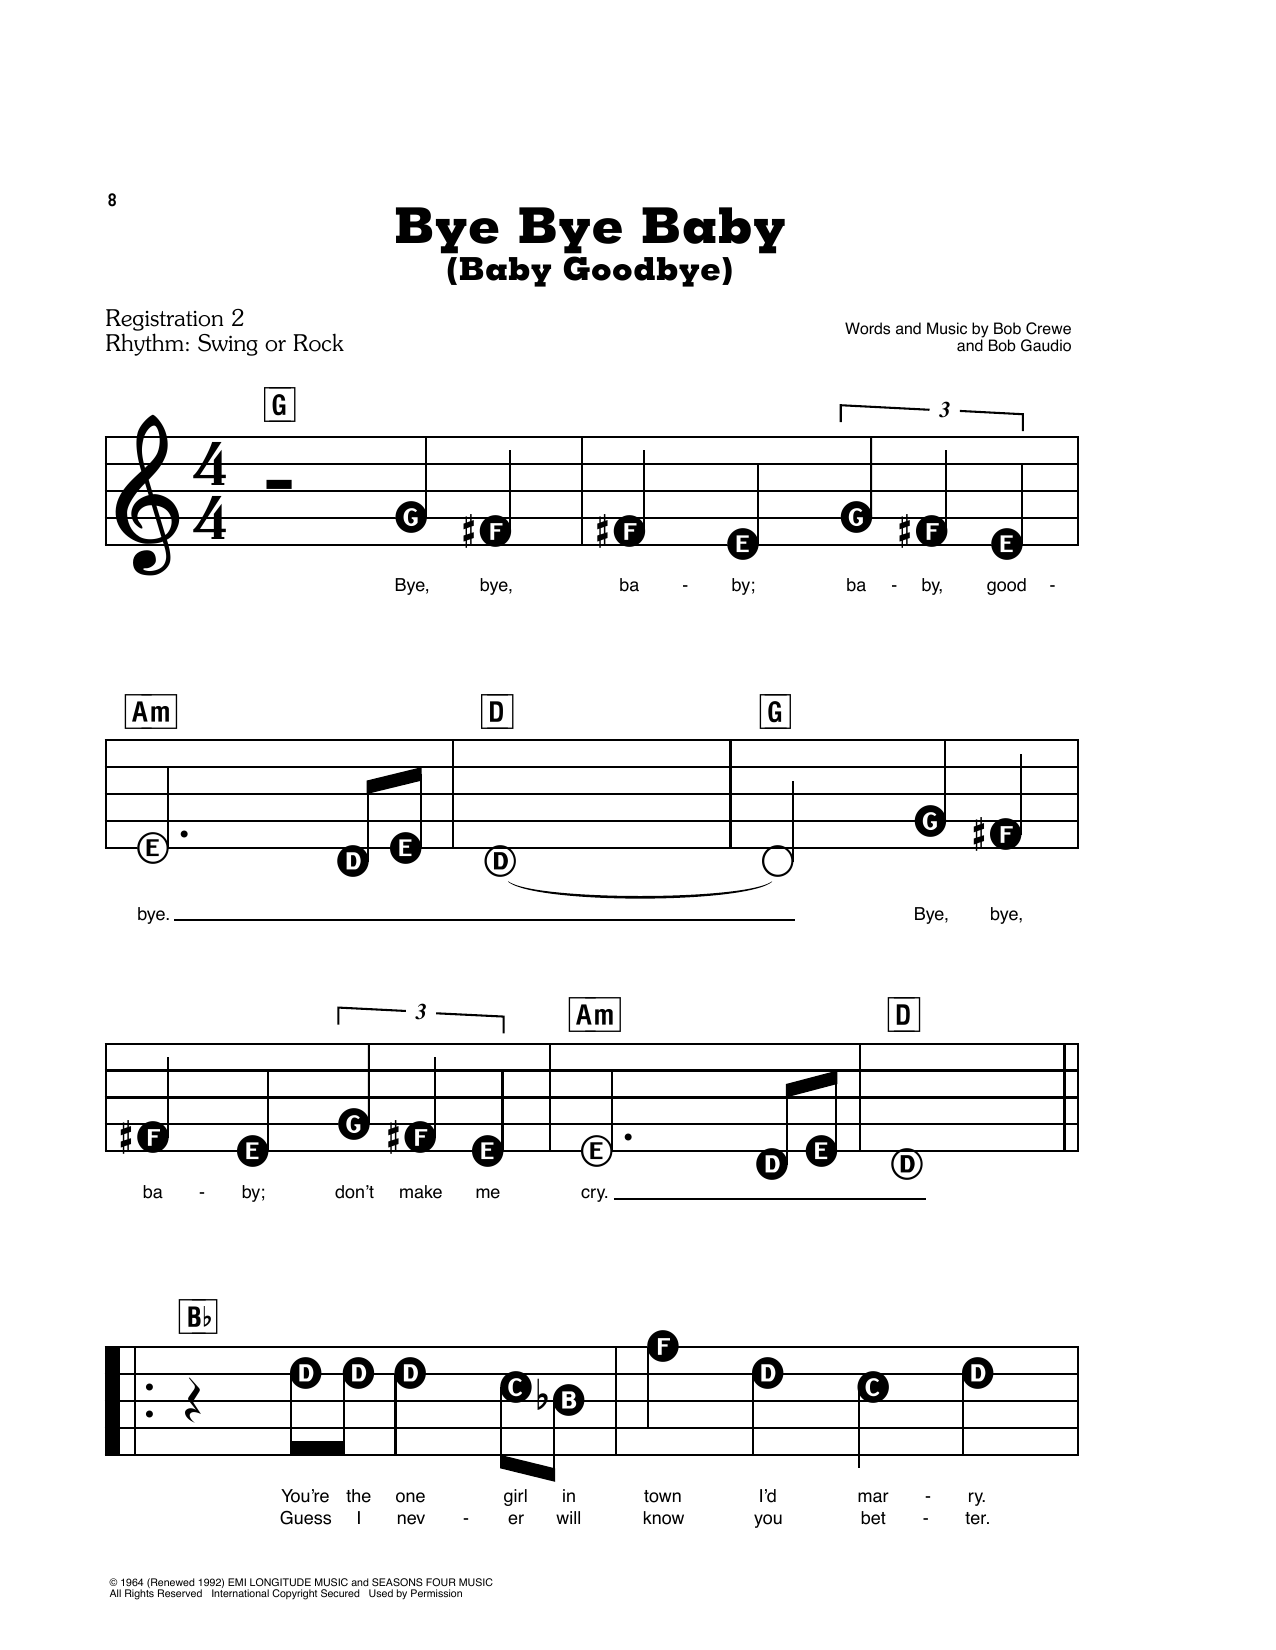 Bye Bye Baby (Baby Goodbye) (E-Z Play Today)